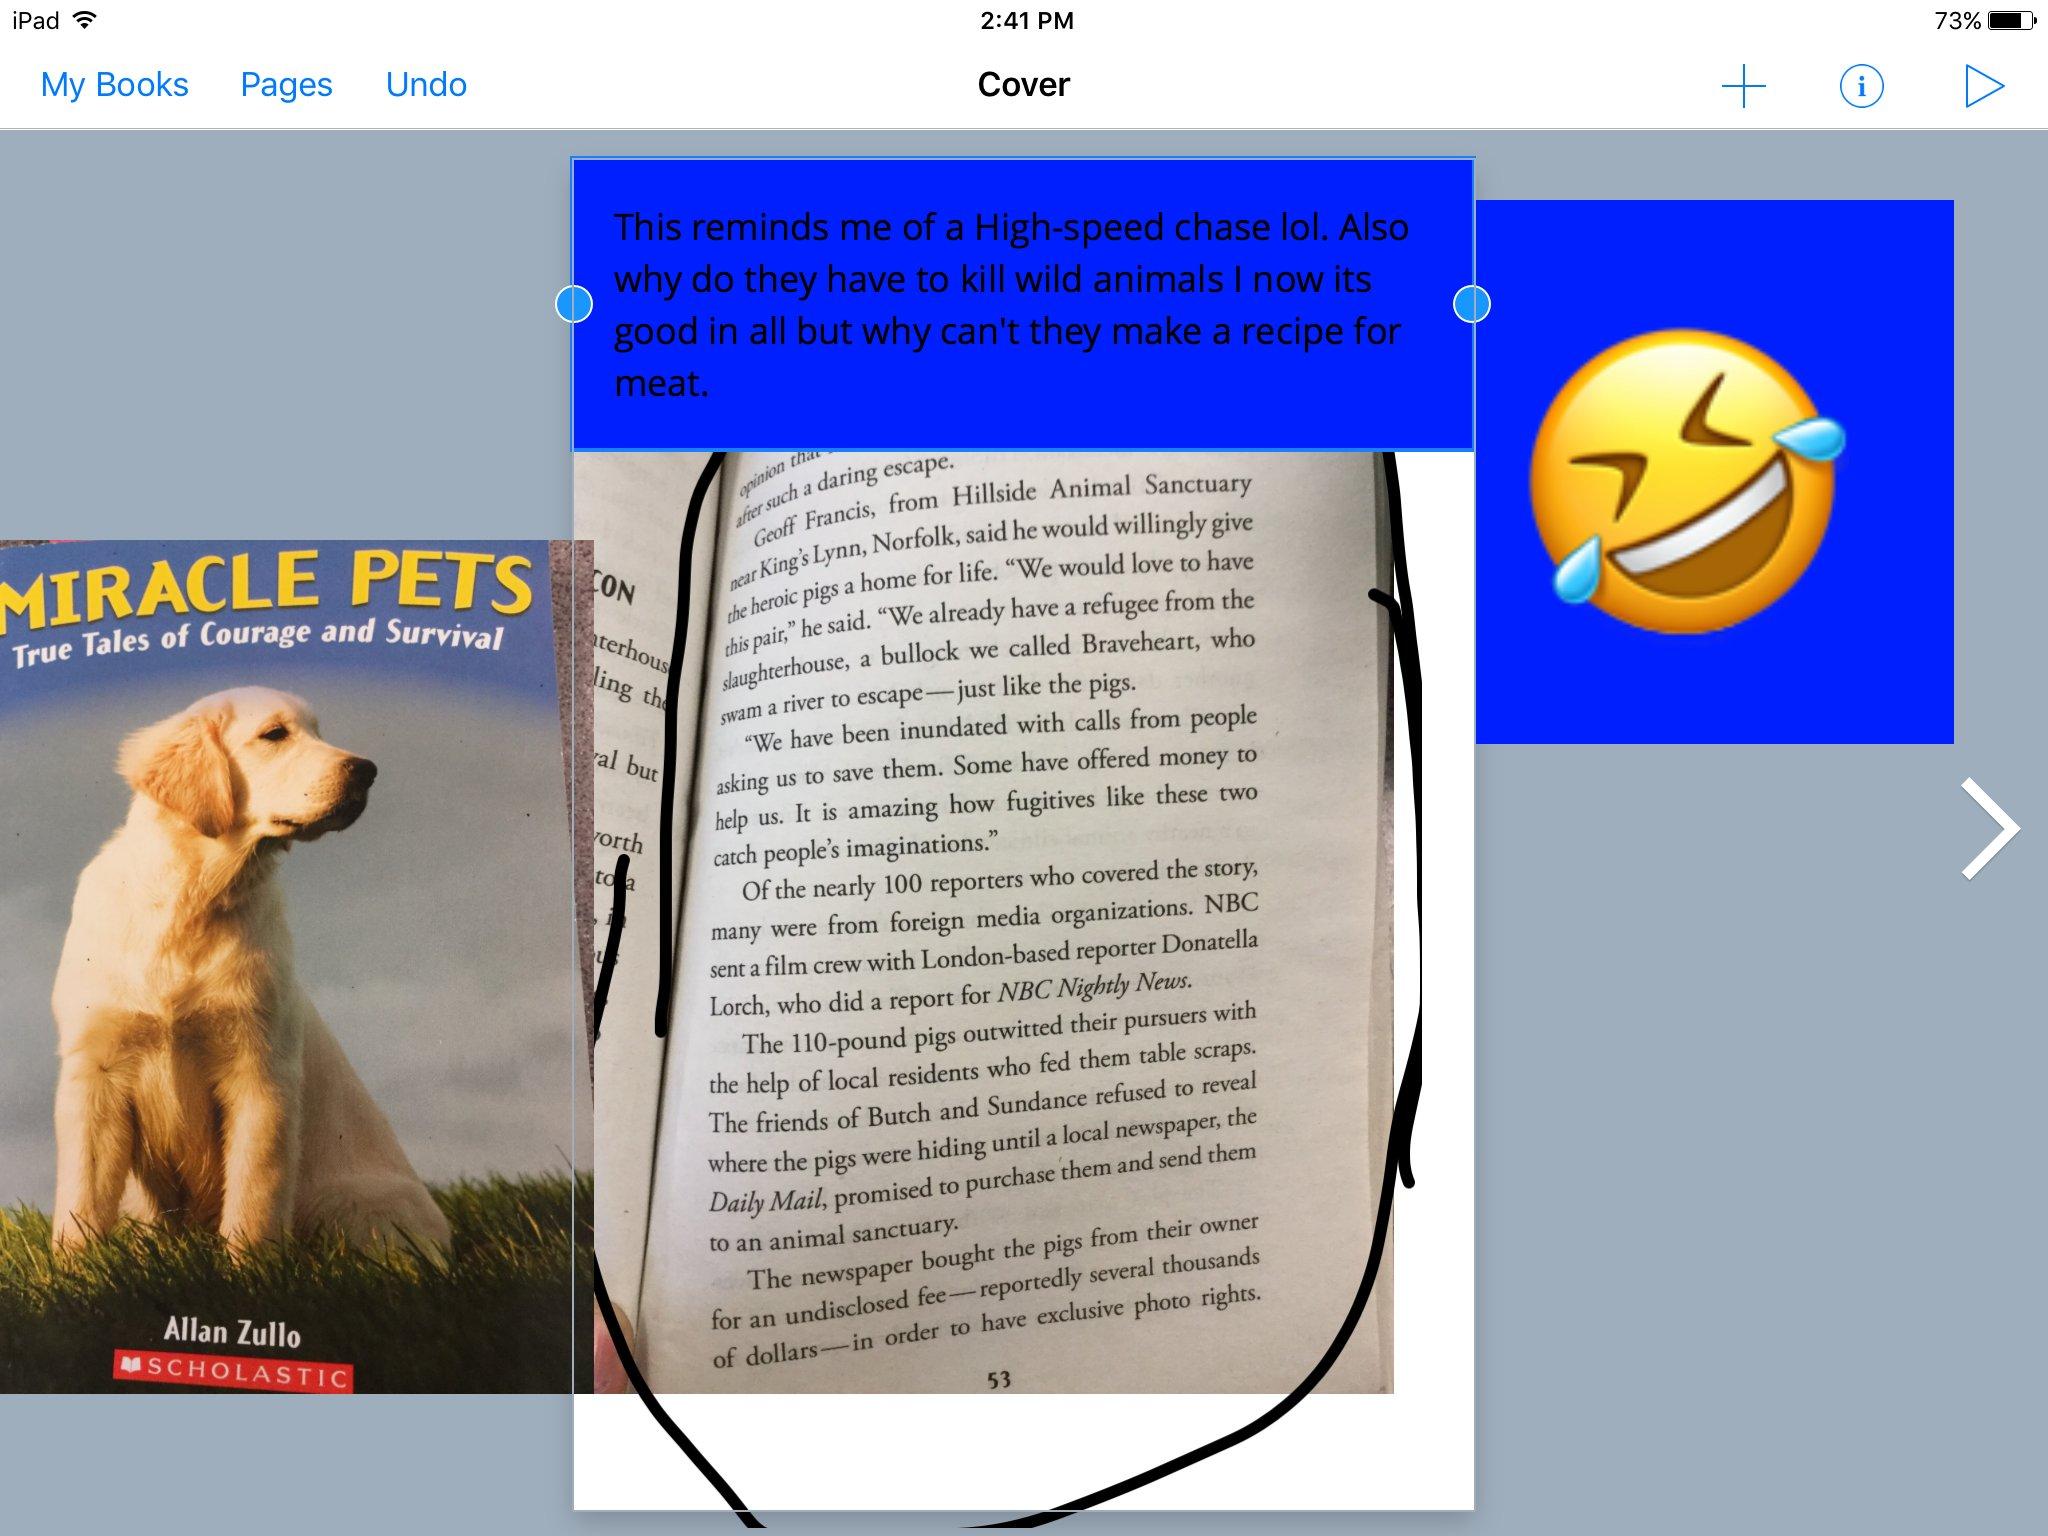 #booksnapswk2 #booksnaps JZ_4Vo @verovoig #betl https://t.co/6Ec5ILX9b7